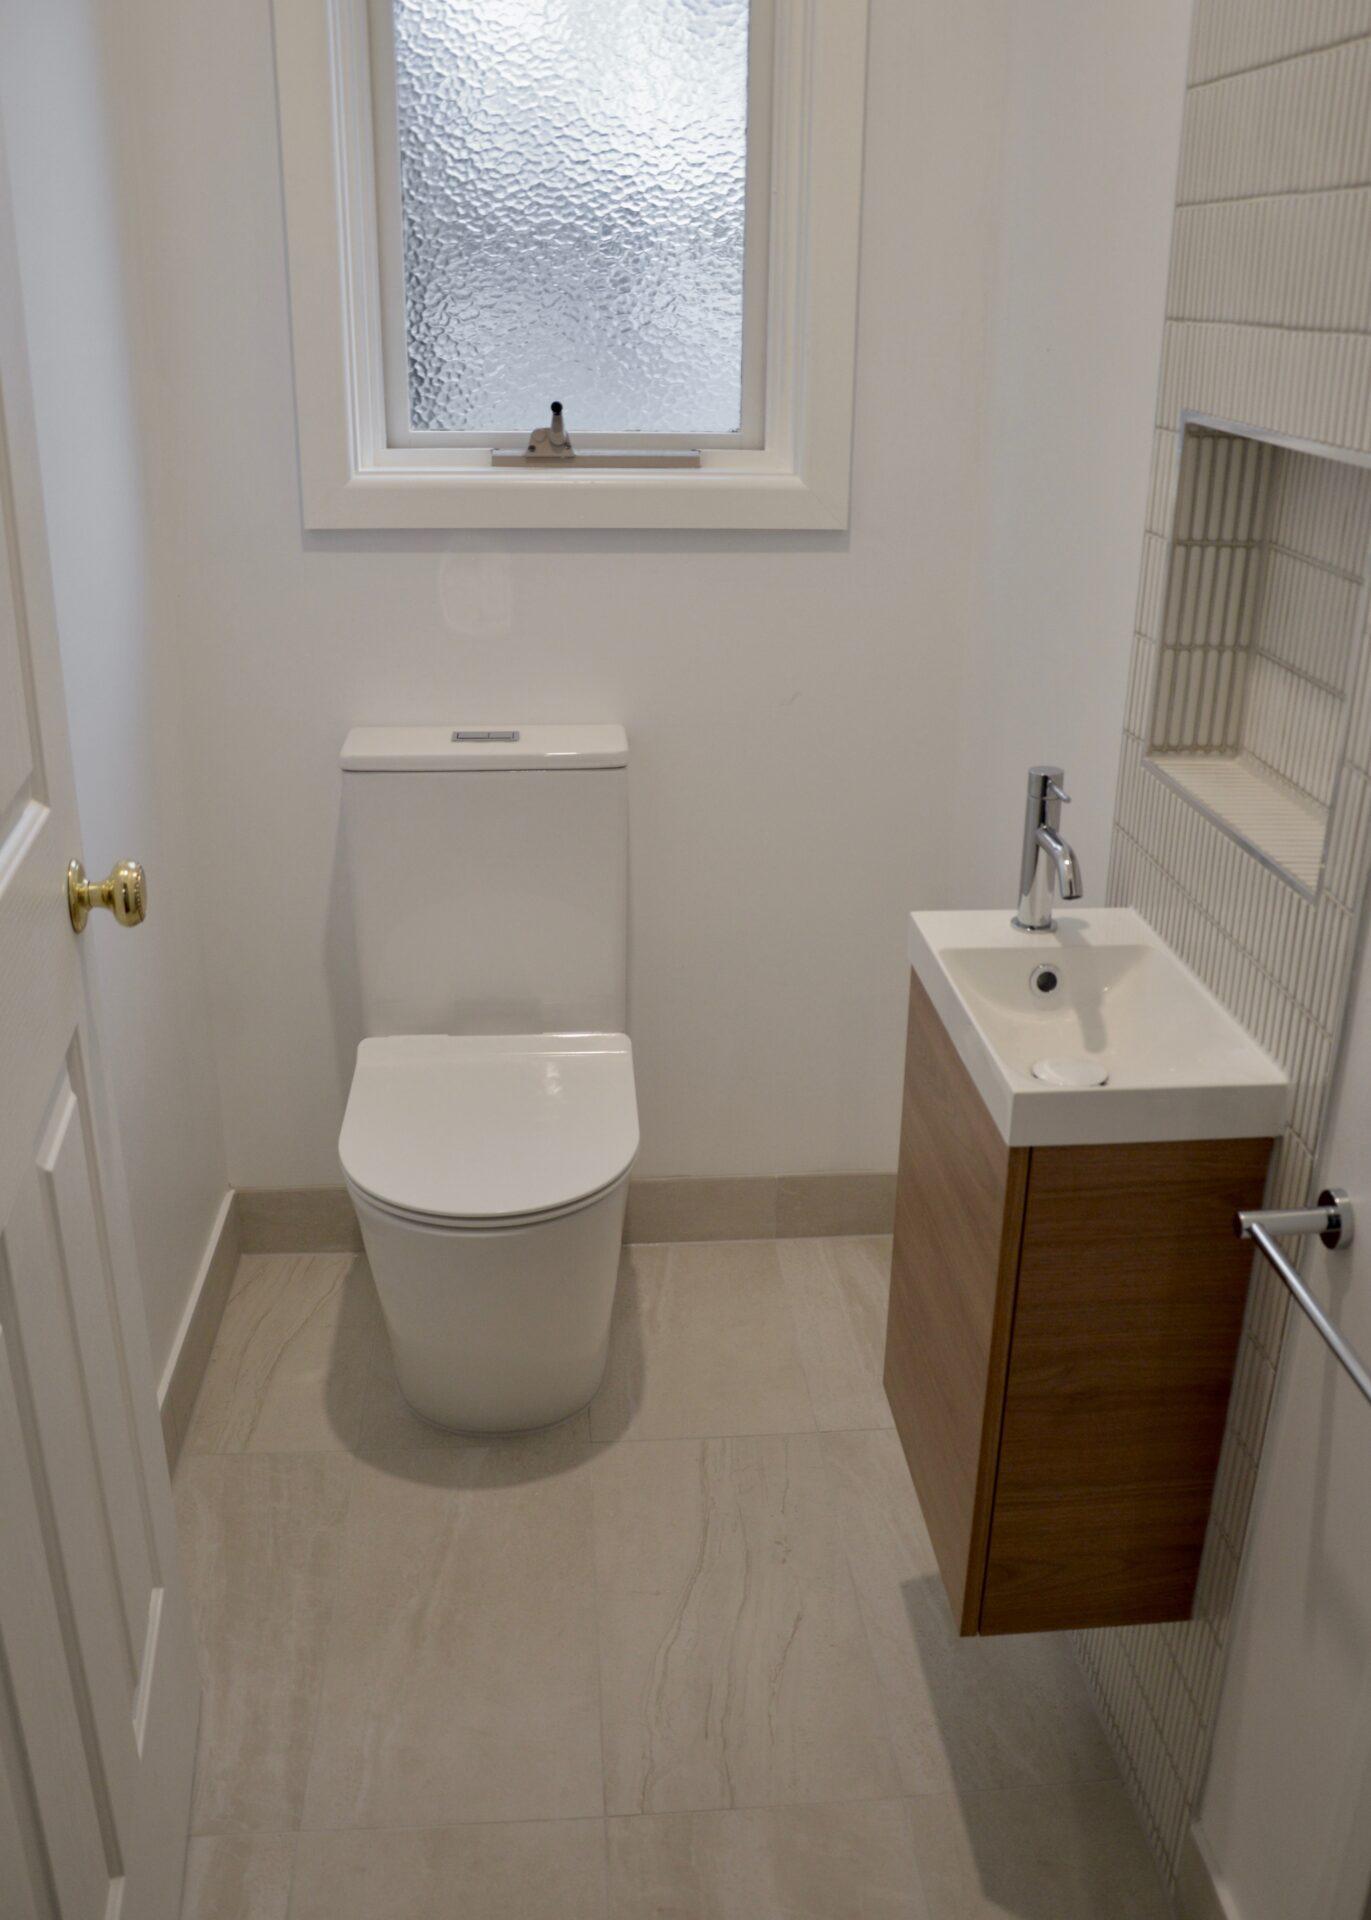 Hilton Street Bathroom Renovation Services - Bayview Renovations